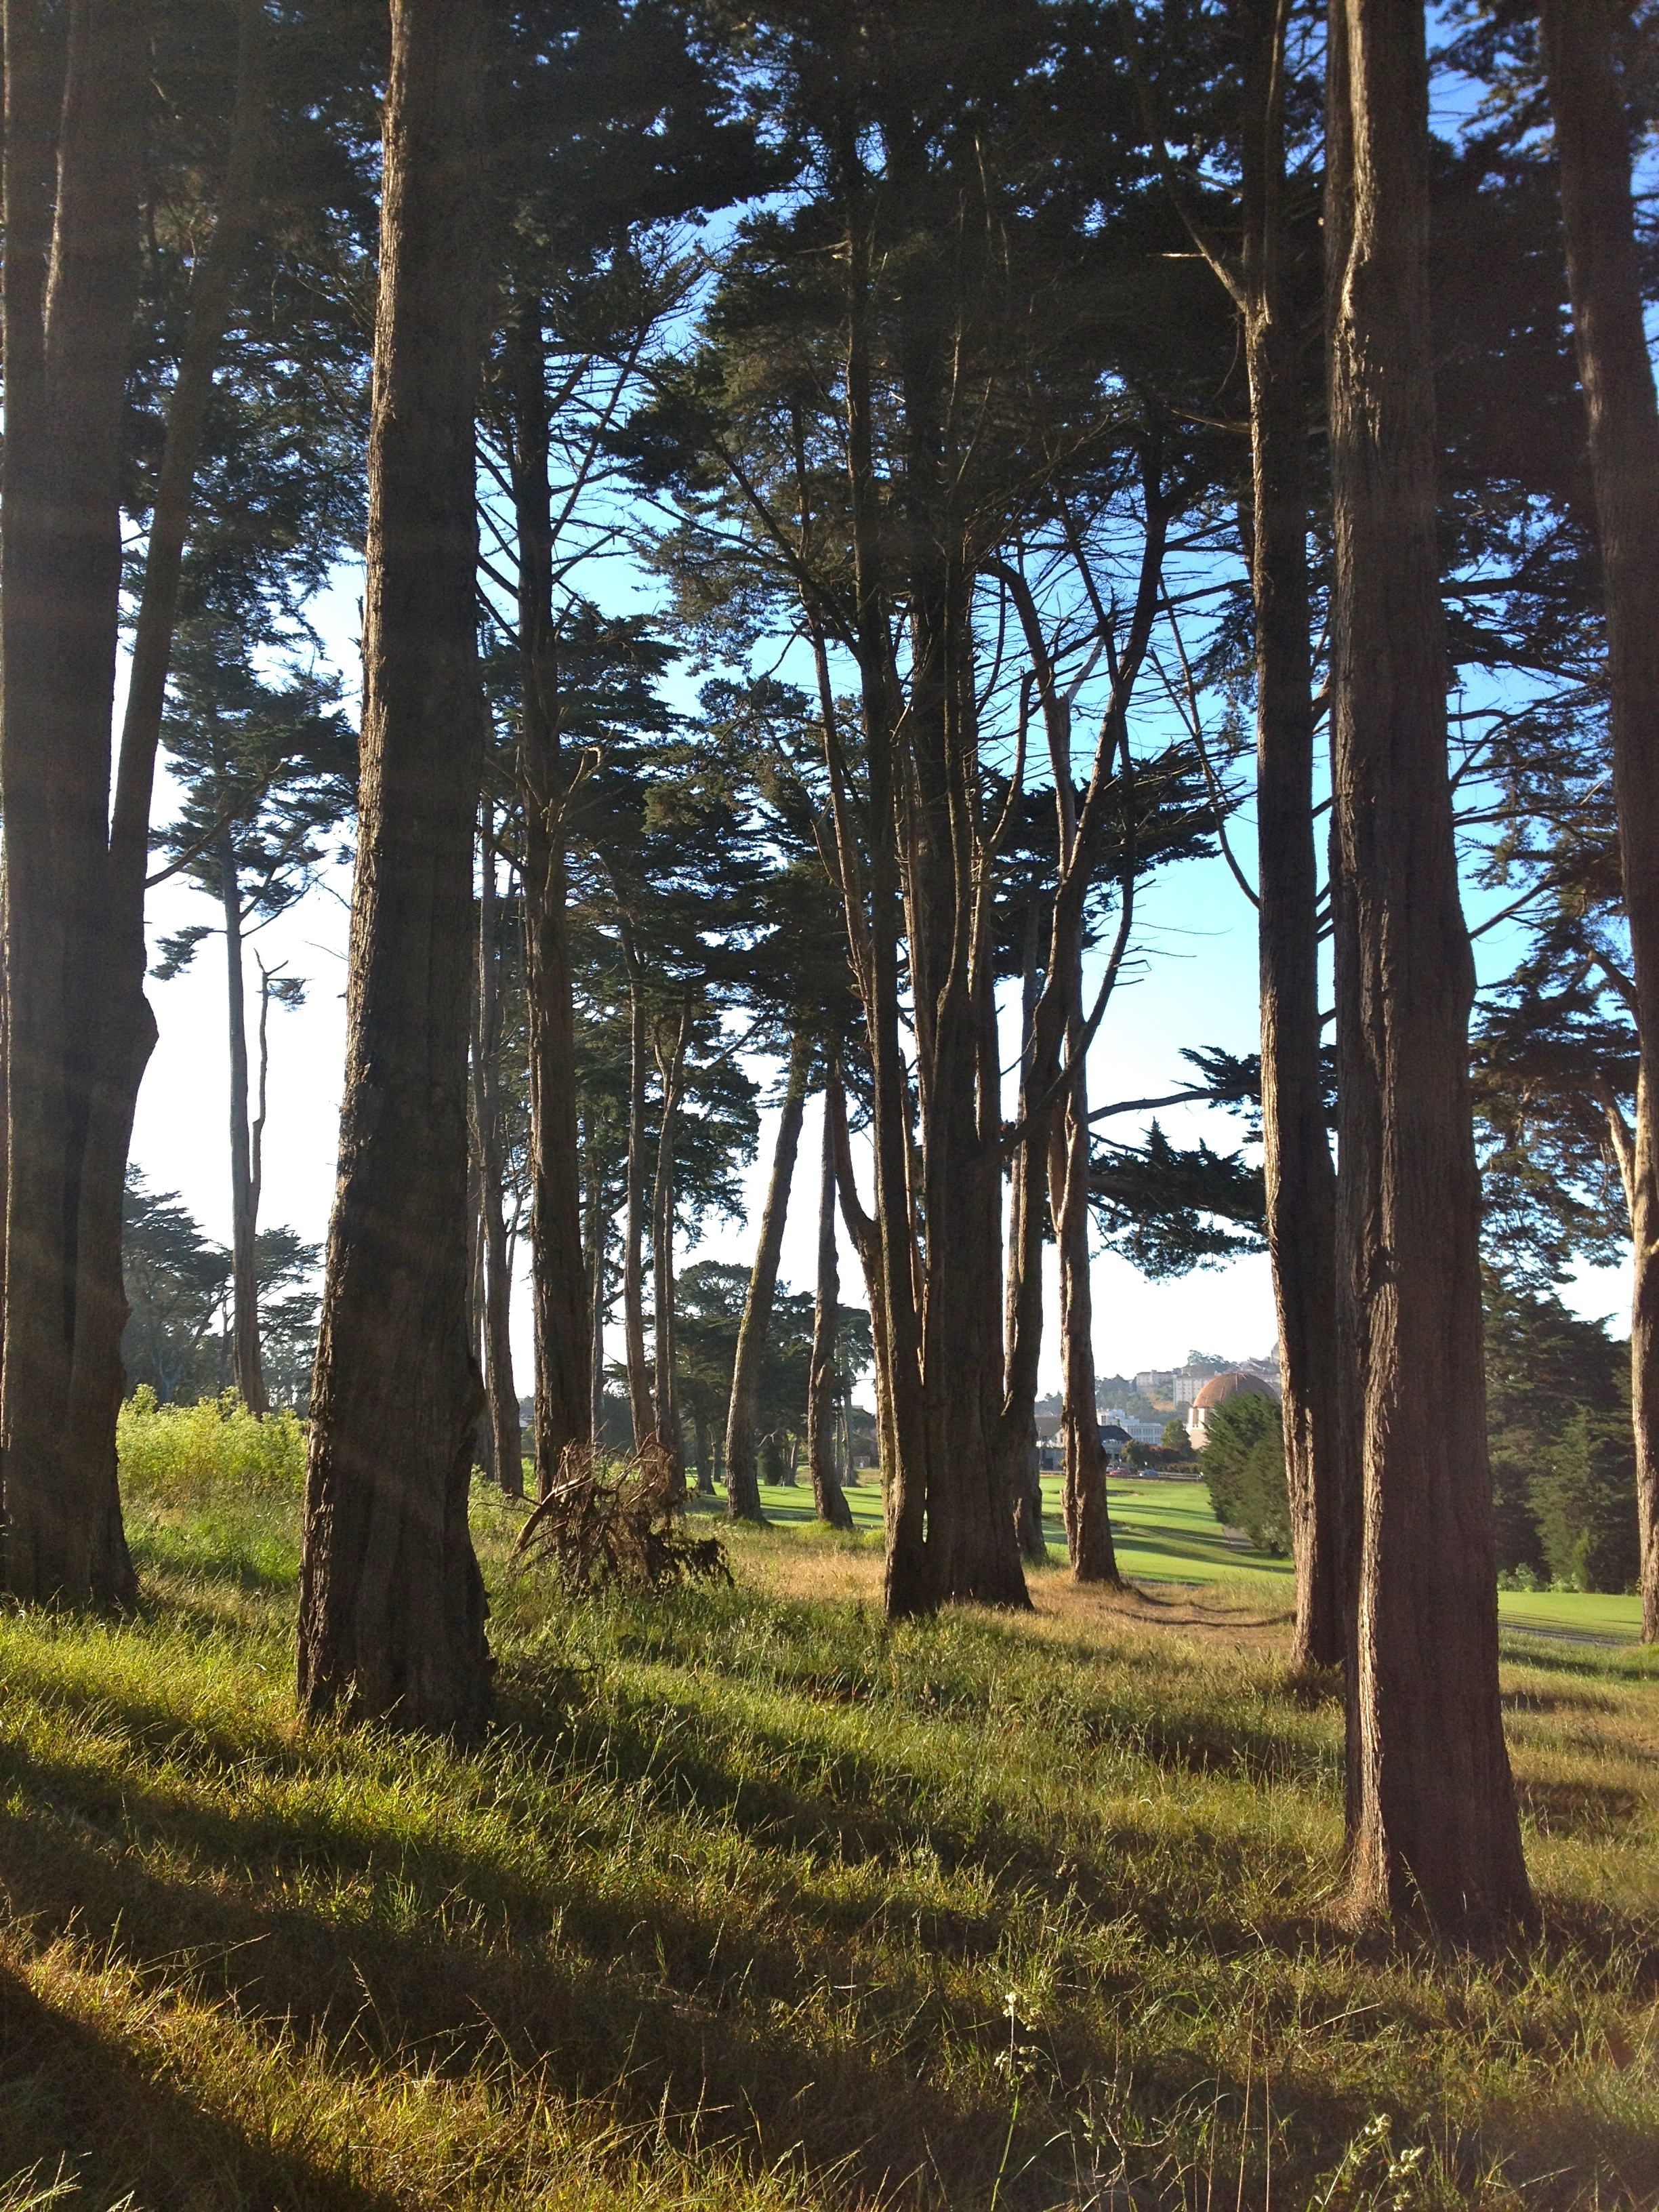 Early morning hike around the Presidio.